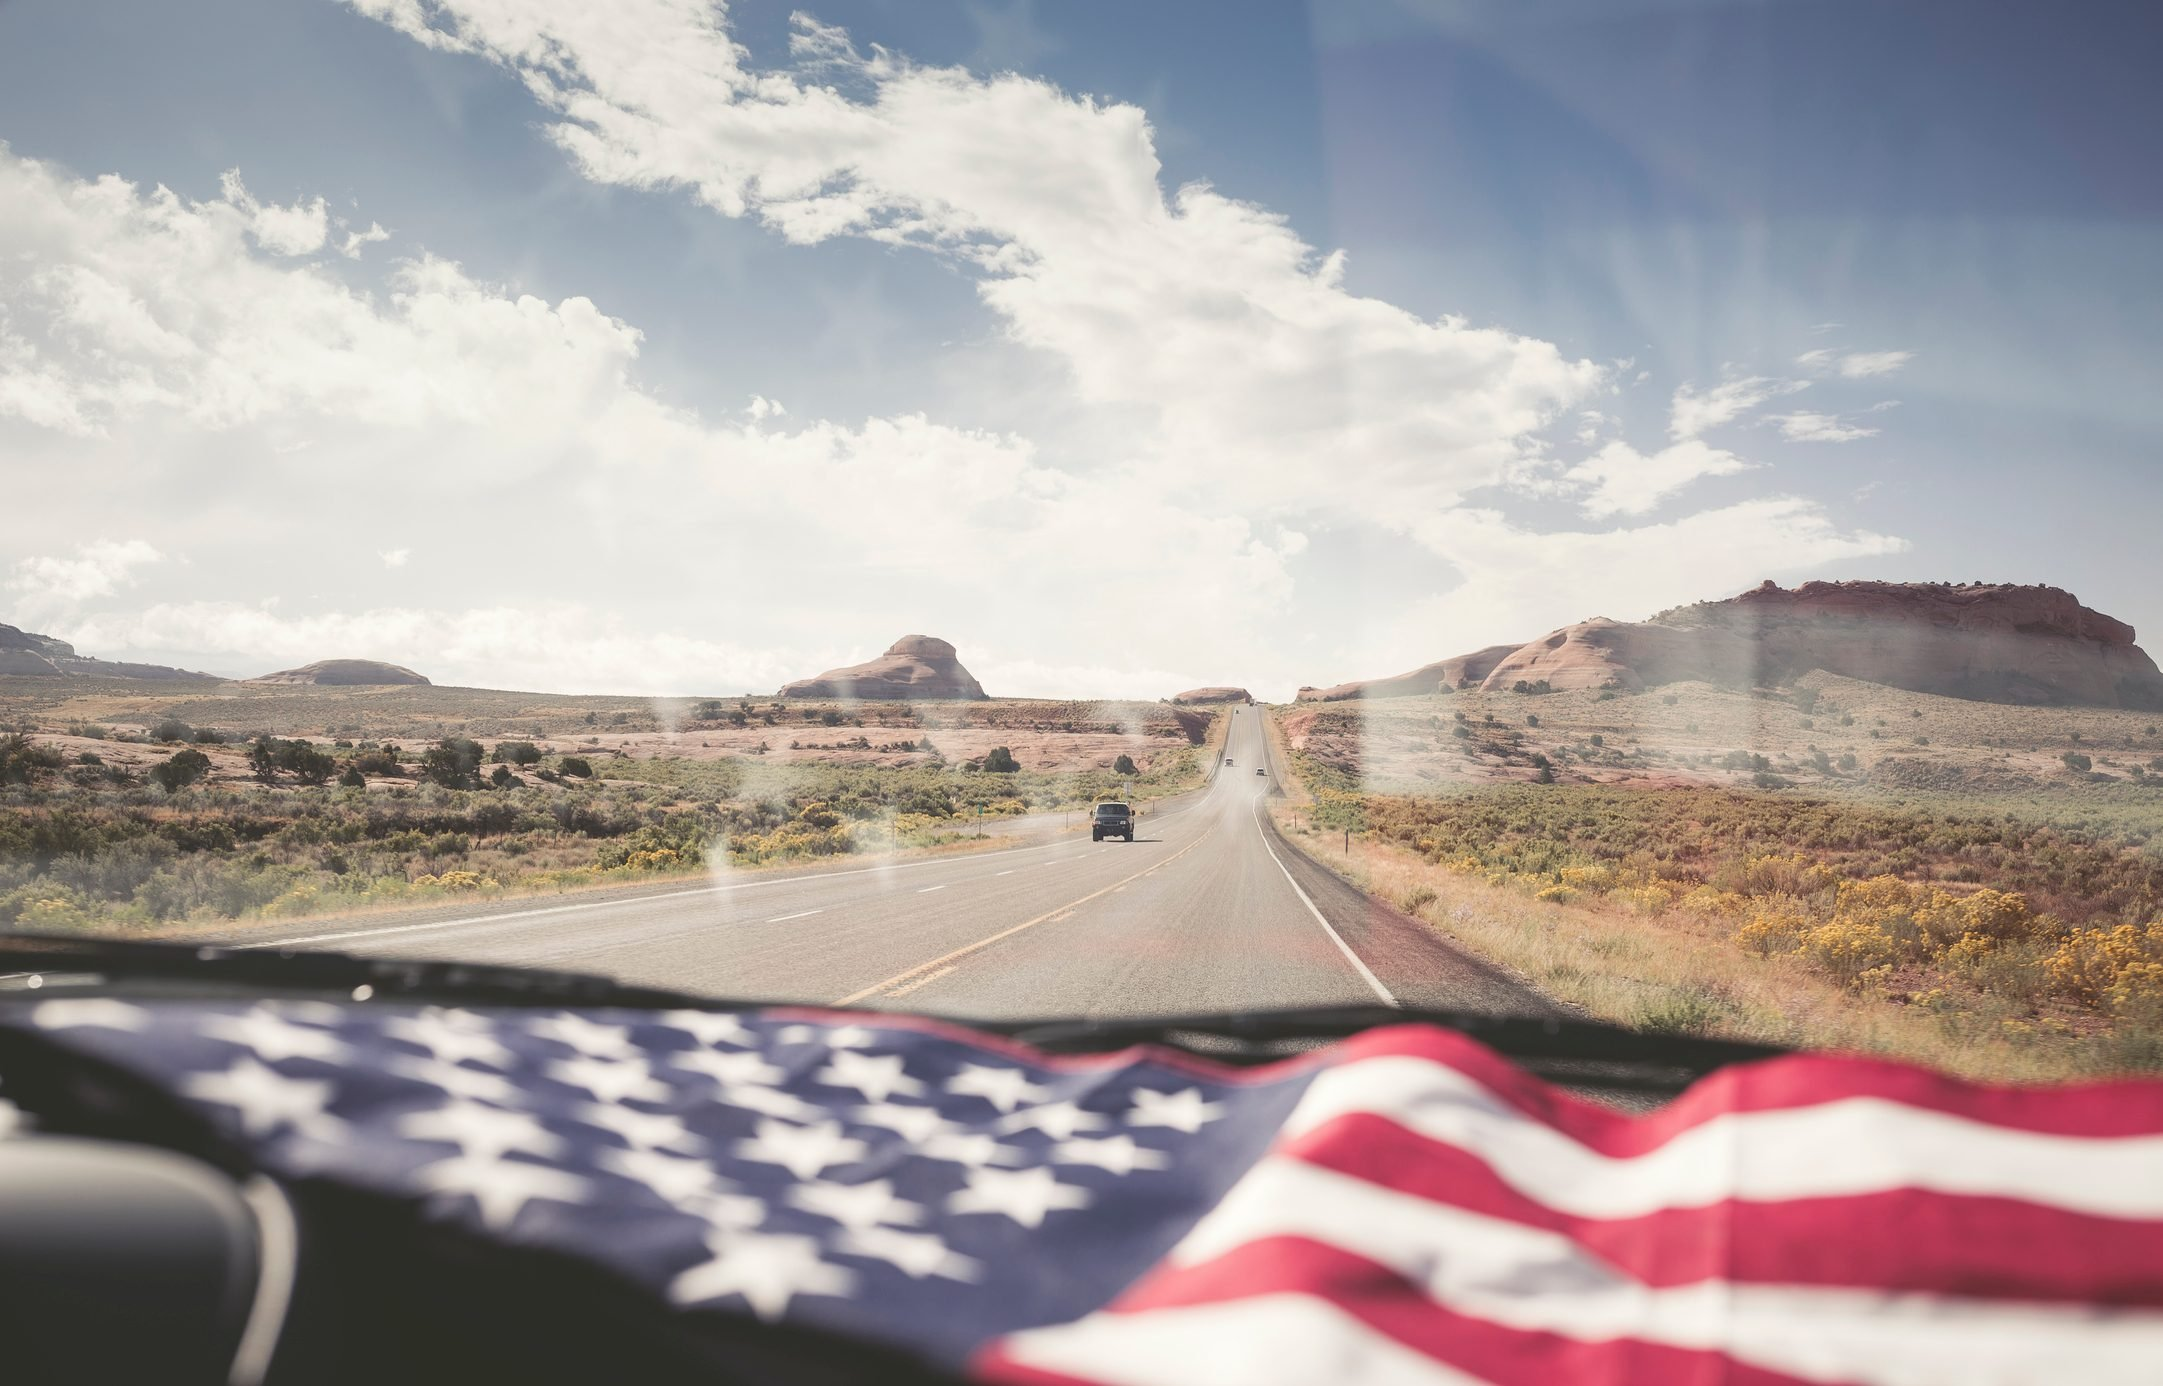 American Flag lying on dashboard of a car on the road in Utah